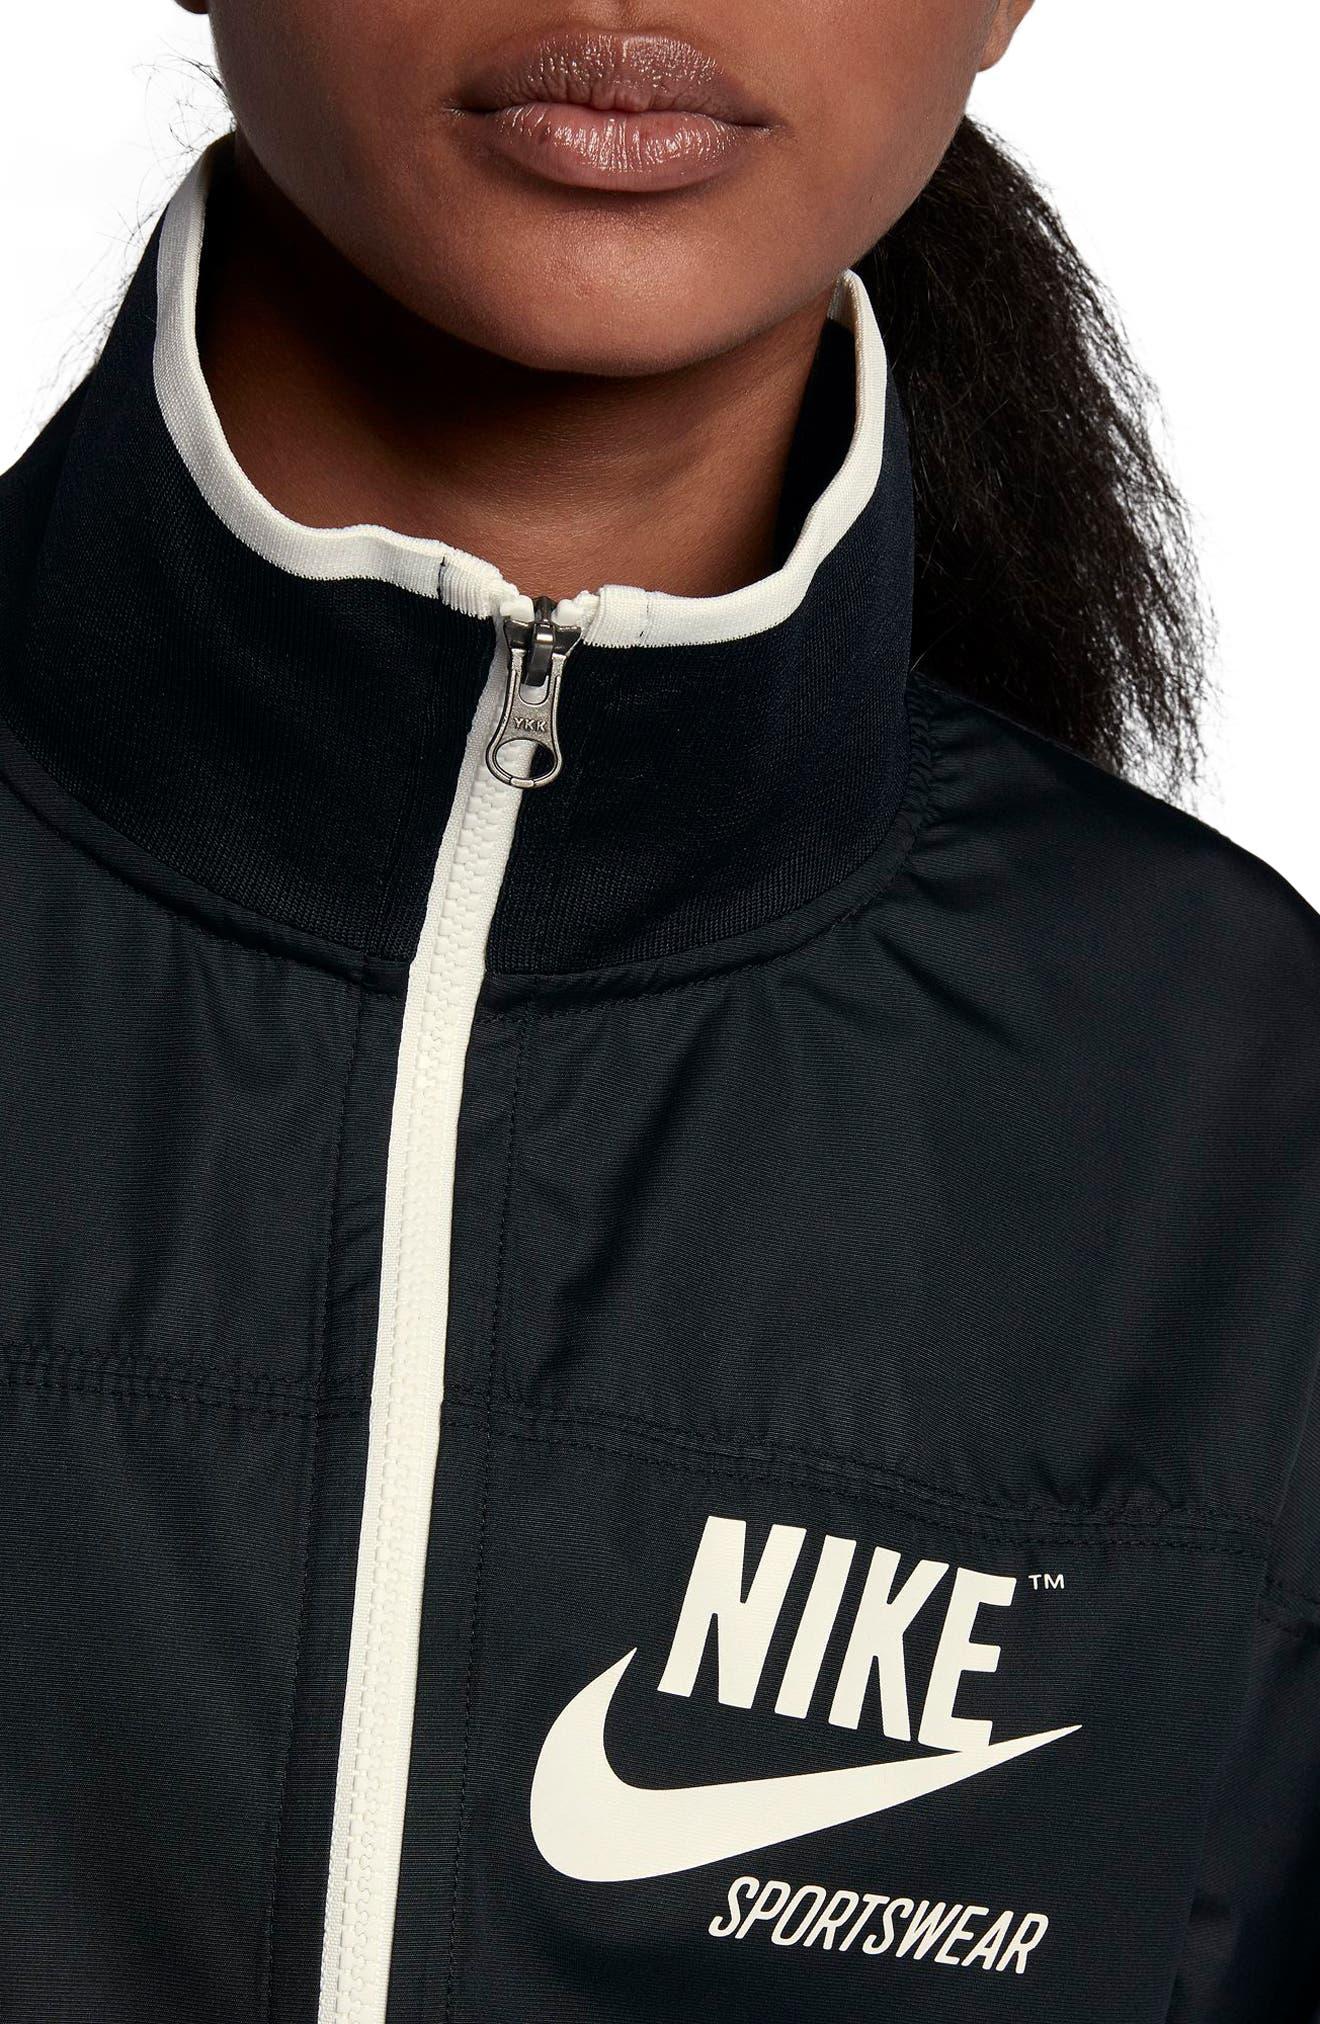 Sportswear Archive Jacket,                             Alternate thumbnail 4, color,                             Black/ Sail